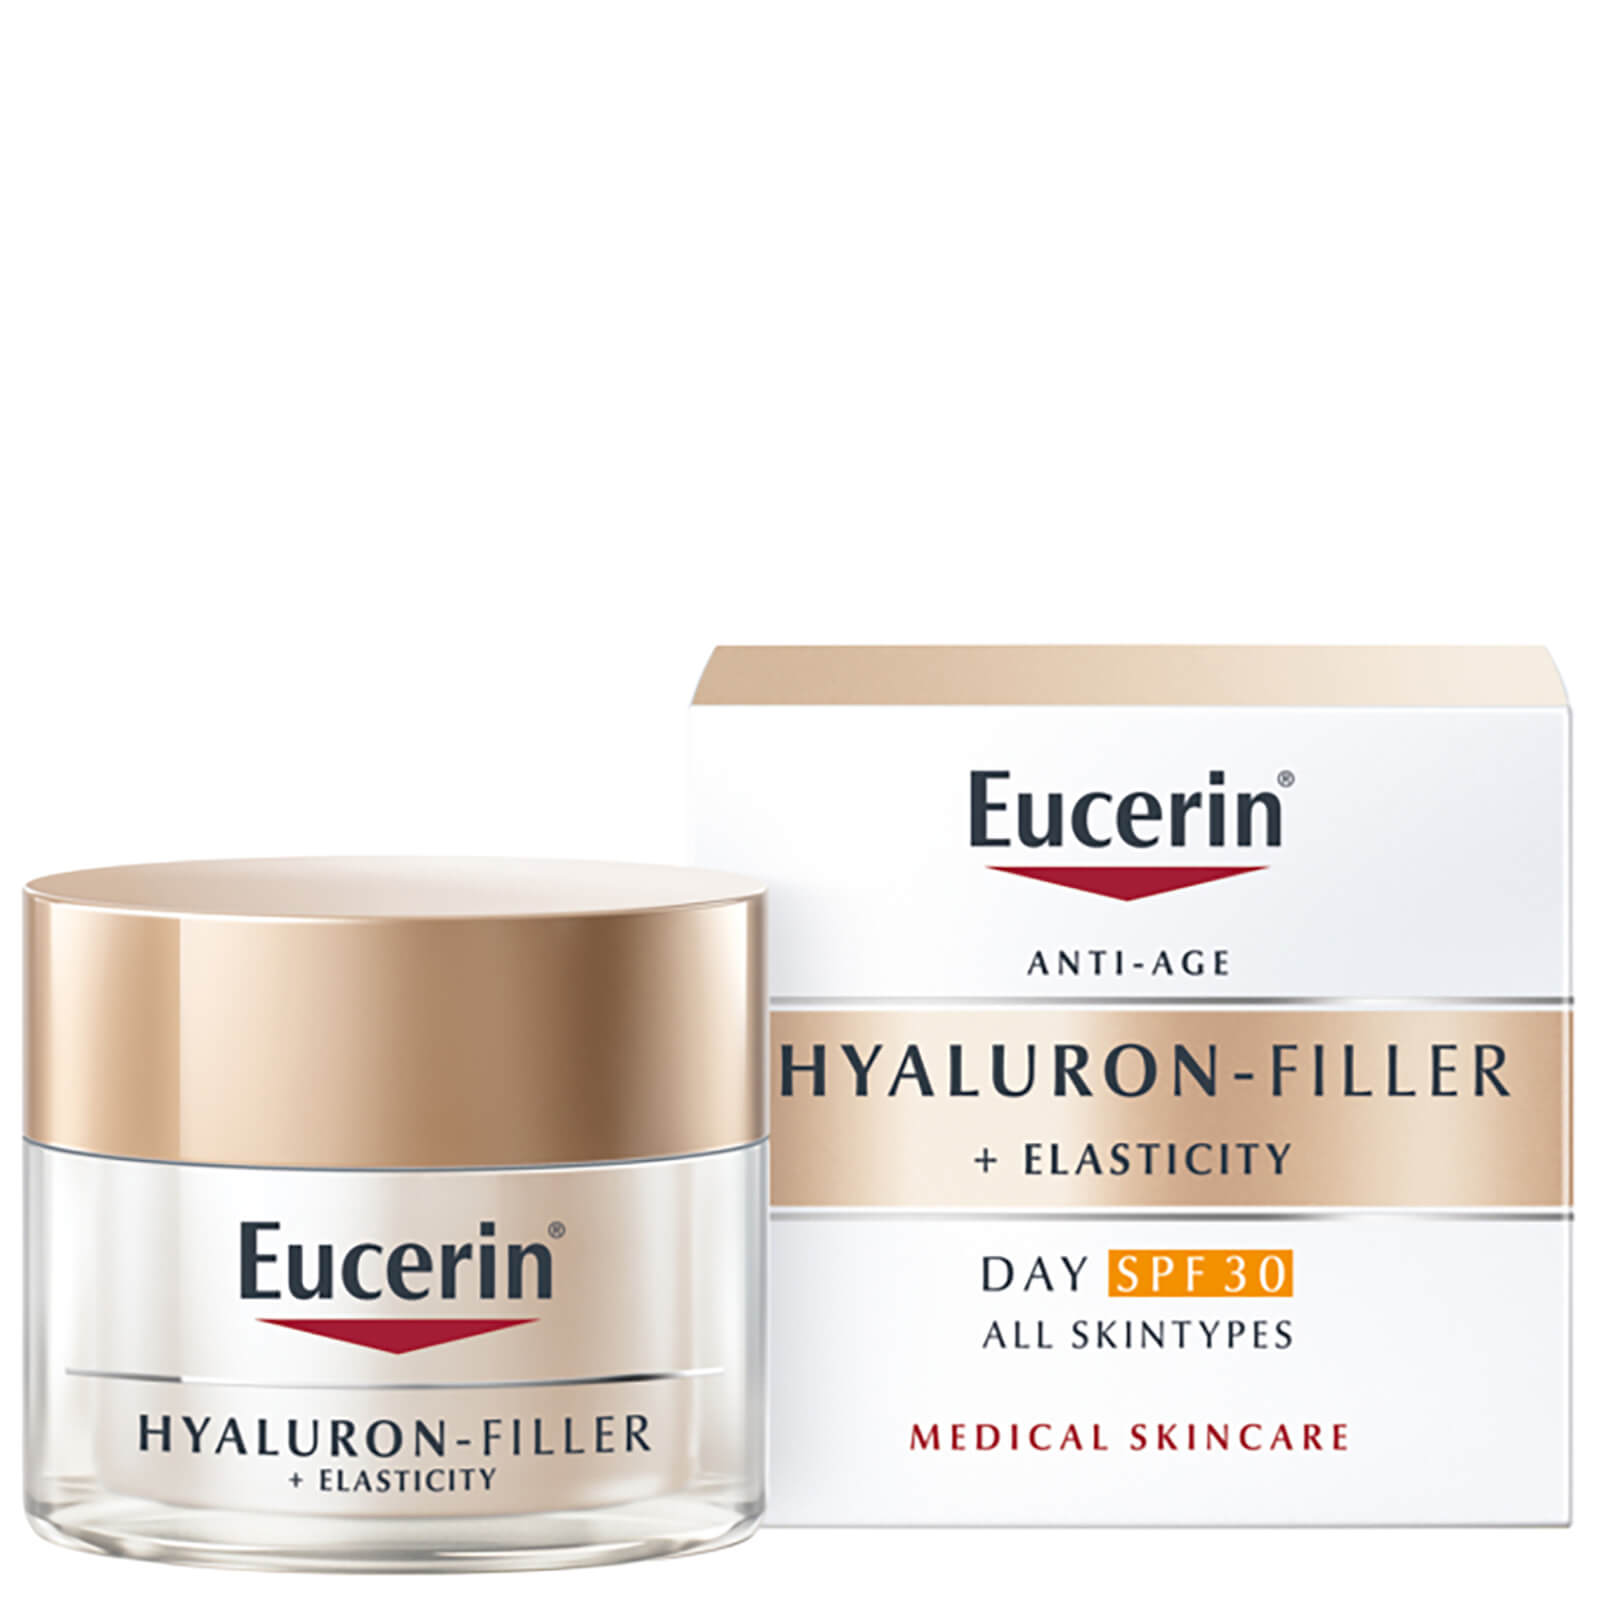 Image of Eucerin Hyaluron-Filler + Elasticity Day SPF 30